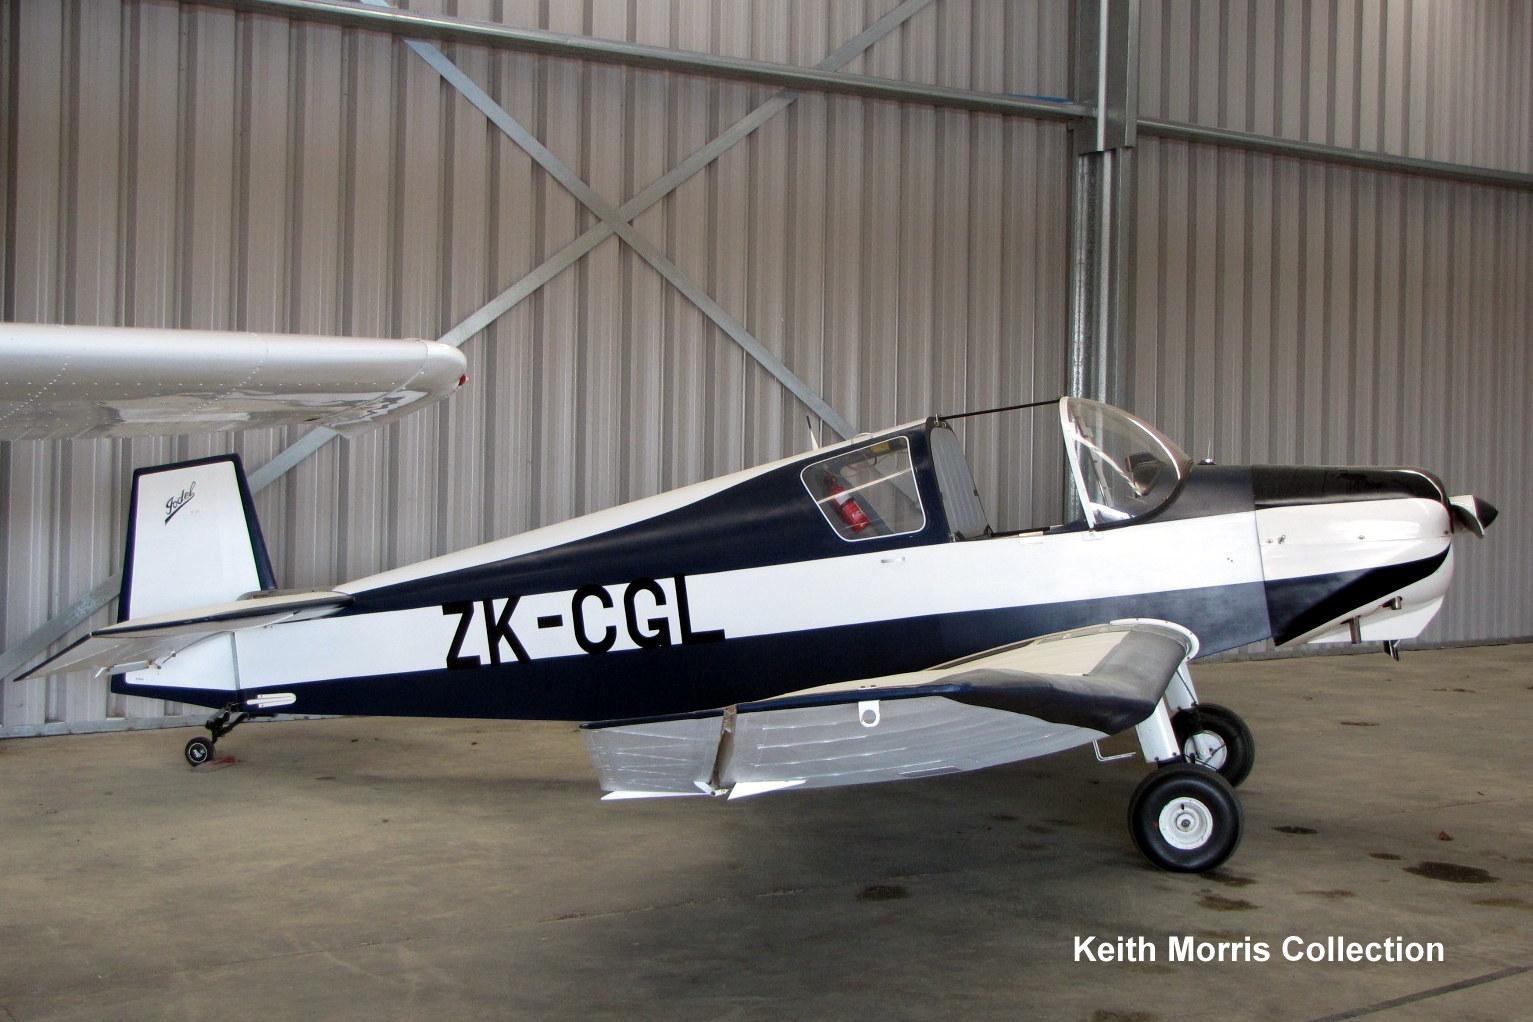 NZ Civil Aircraft: SAA Meeting at Kelly Field, Mercer 21/4/12